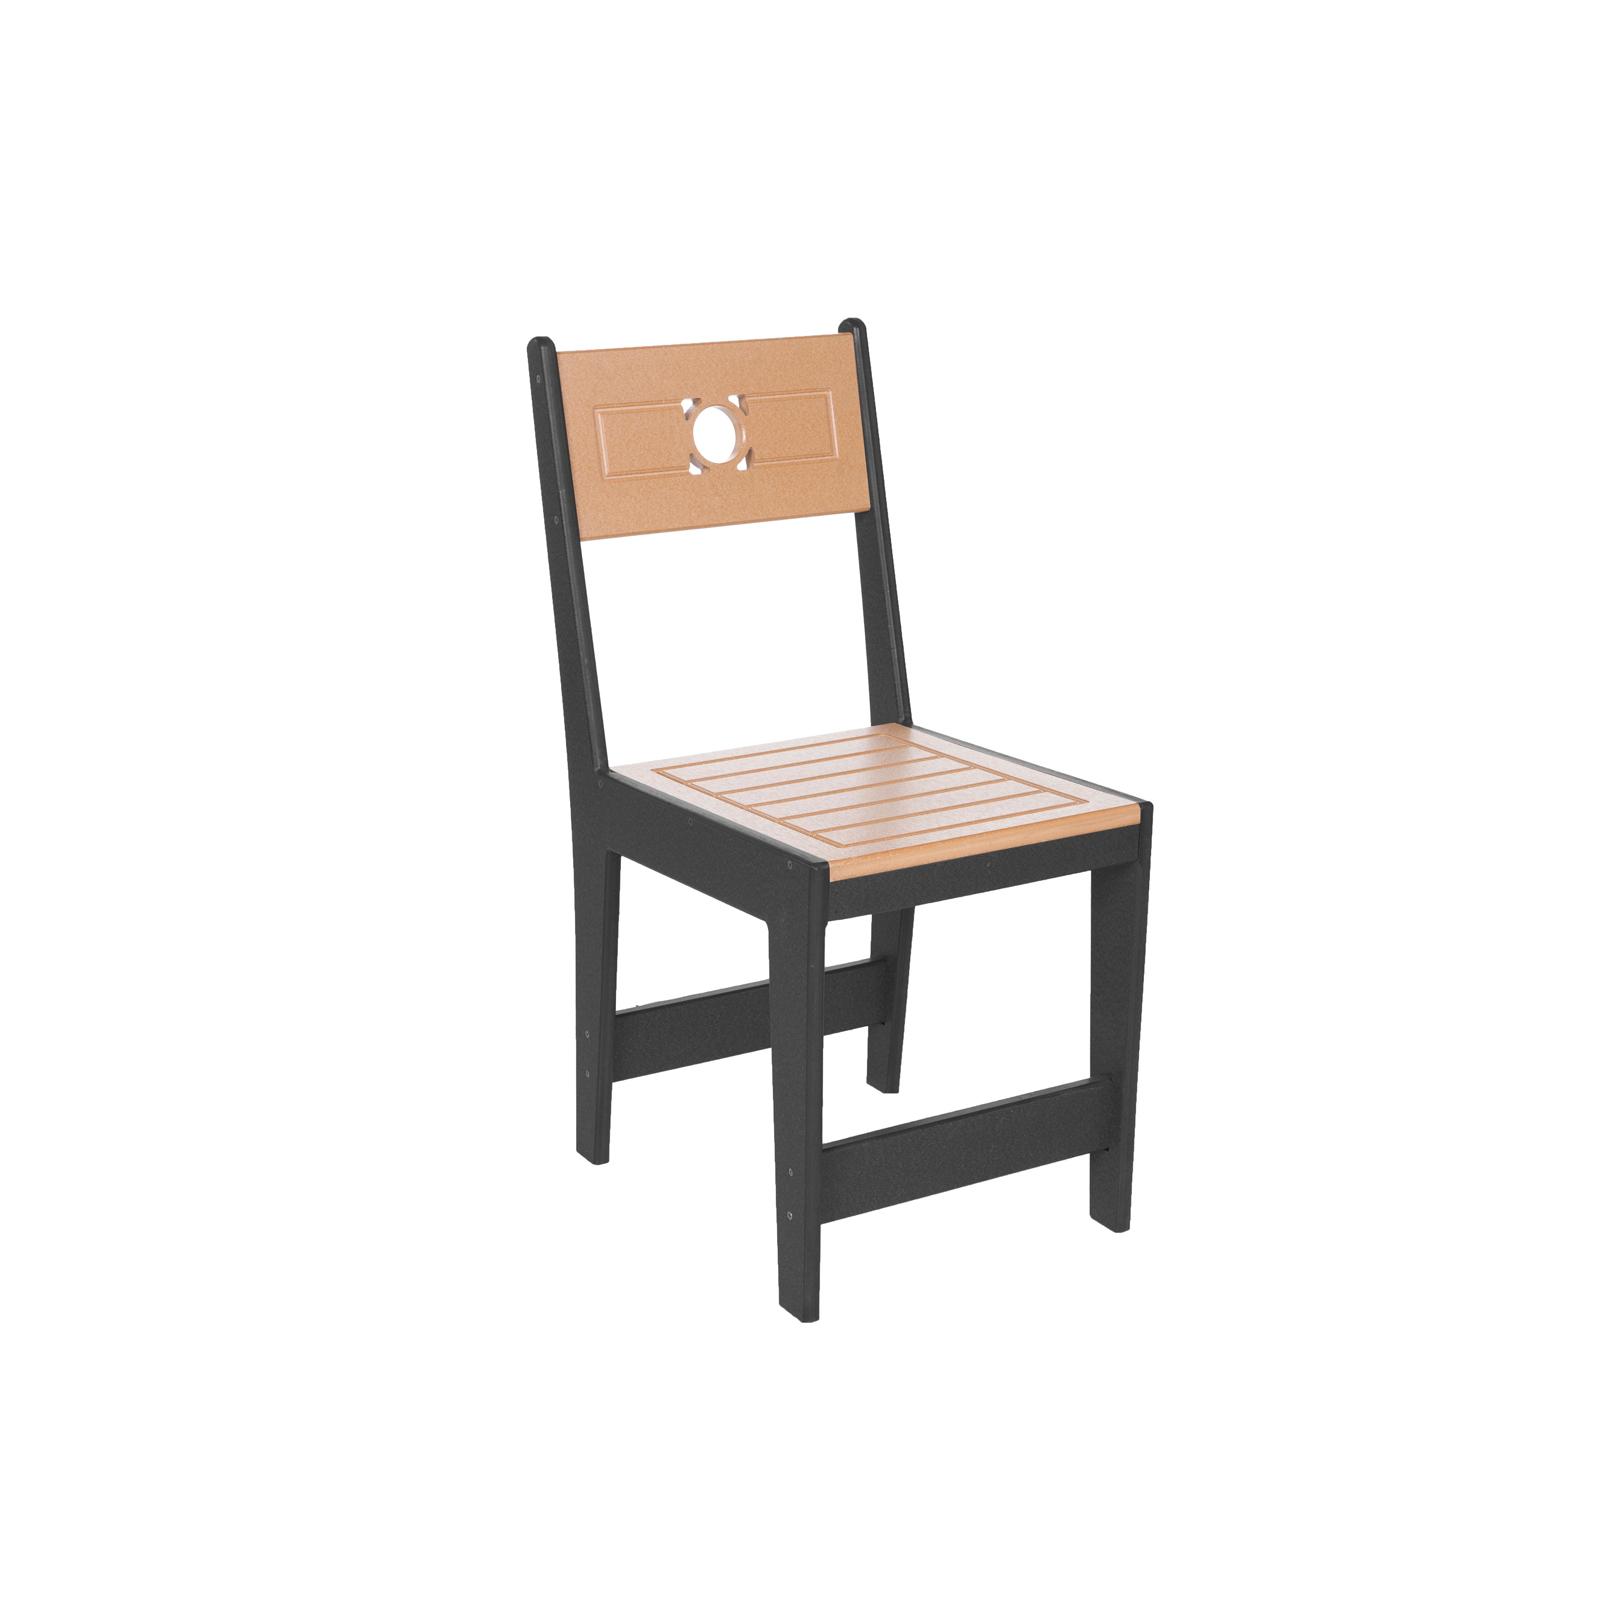 Eagle One Café Commercial Grade Two-Tone Dining Chair, Black/Cedar